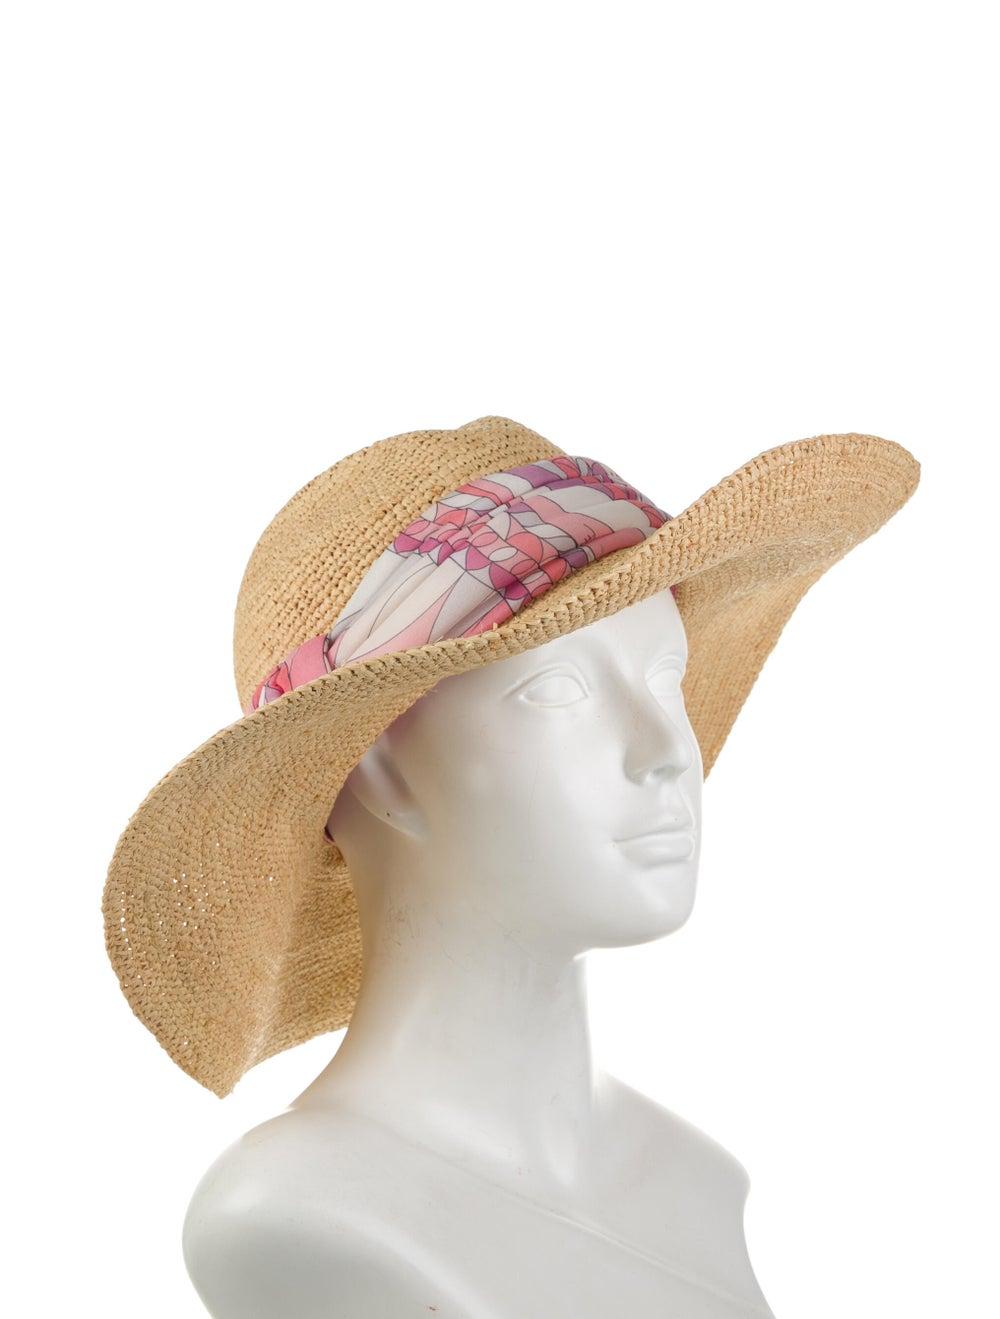 Emilio Pucci Wide Brim Straw Hat Tan - image 3